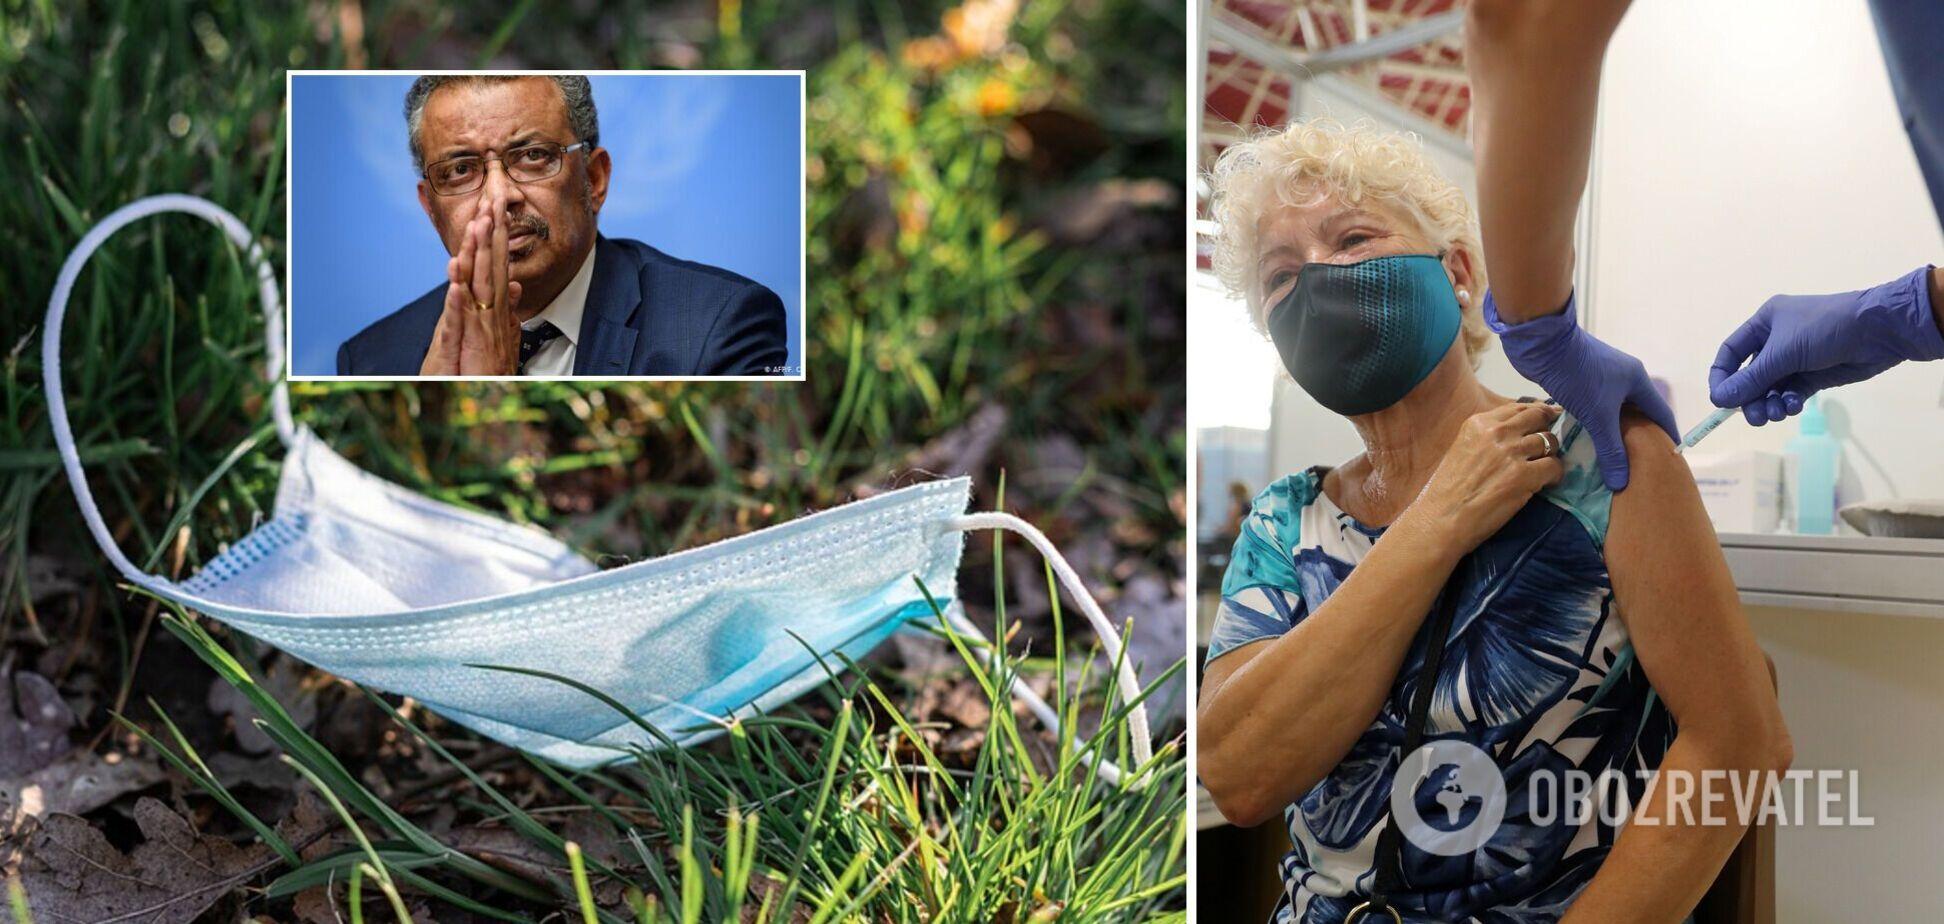 Глава ВОЗ упрекнул страны за отказ от противоэпидемических правил